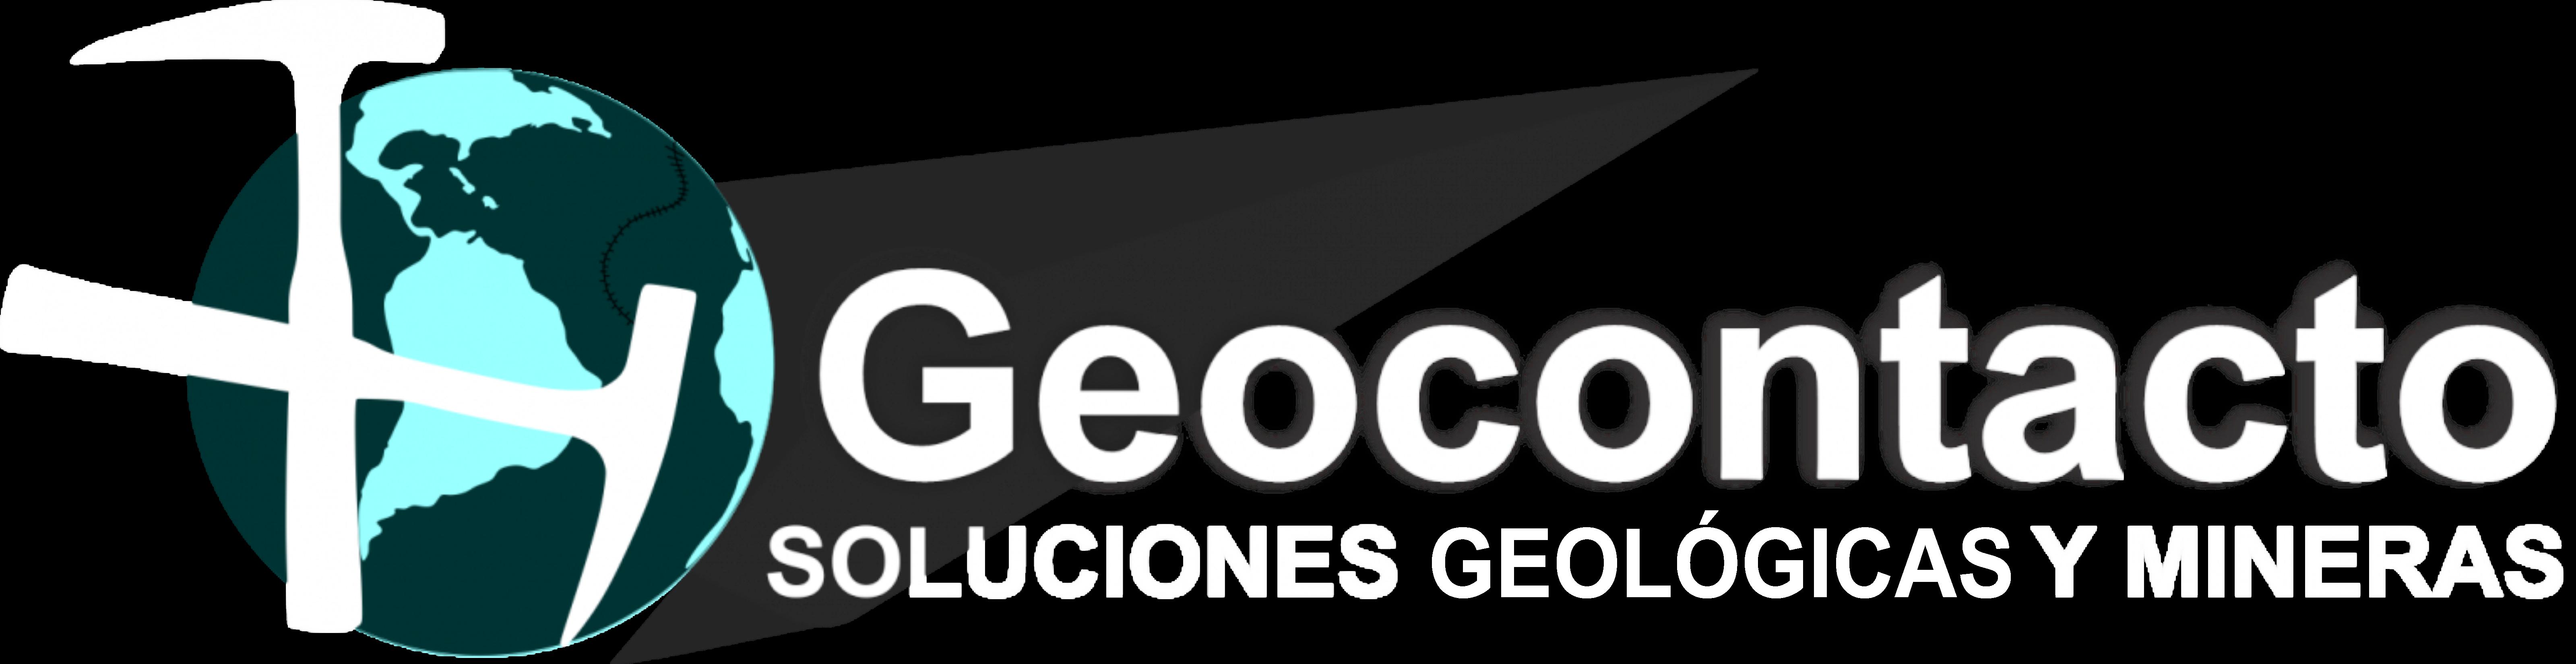 GEOCONTACTO